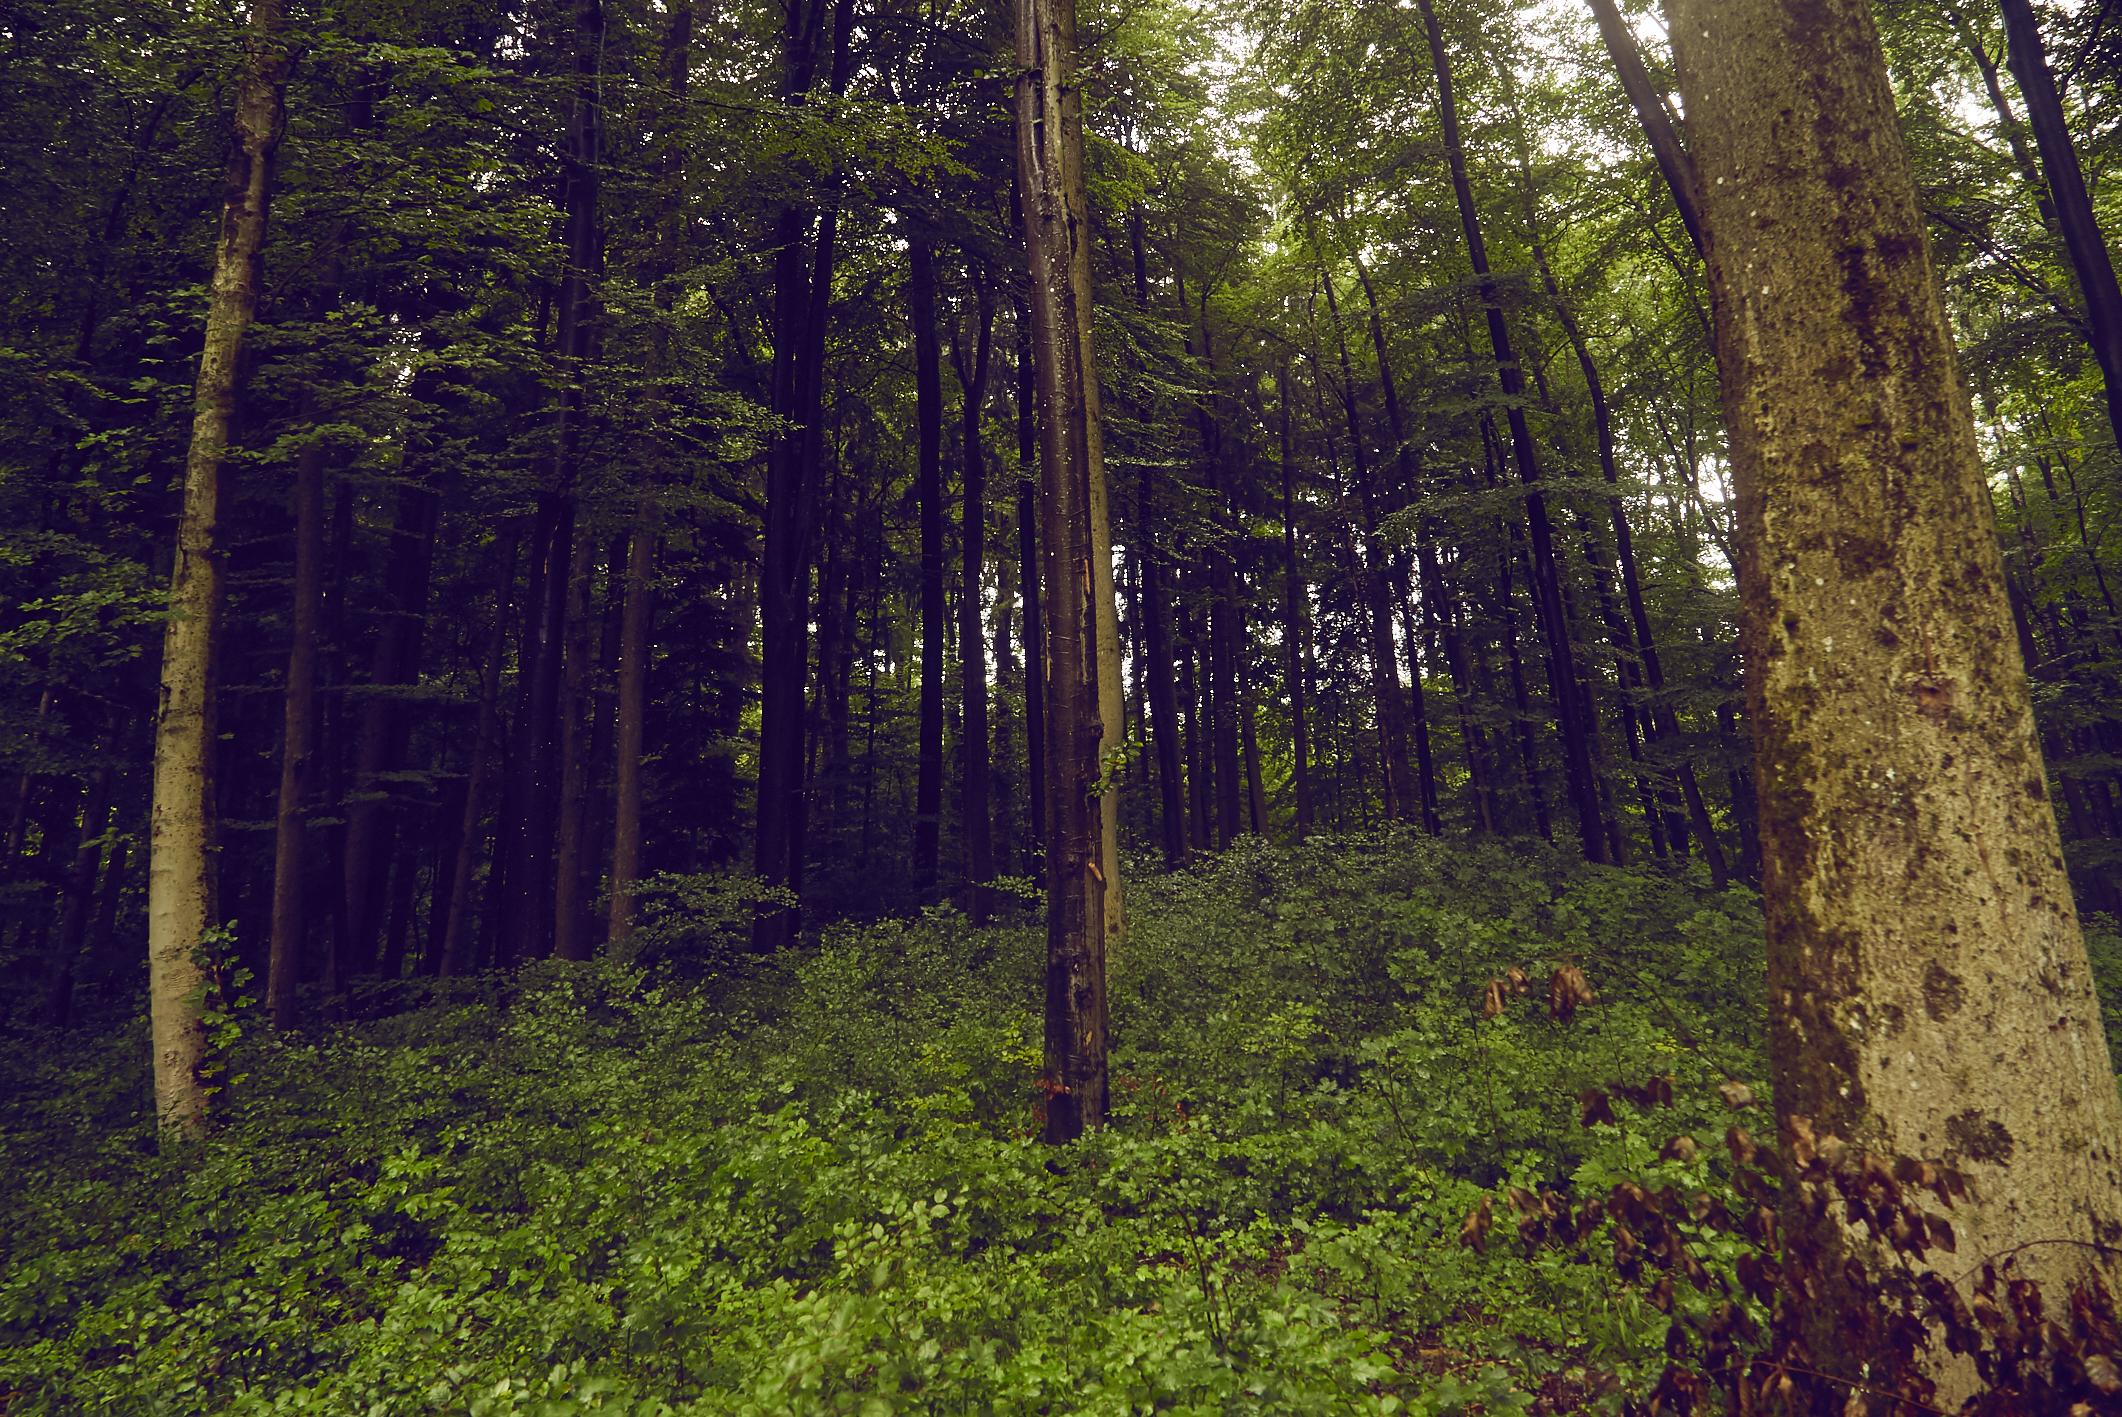 Wald_20170810-6485.jpg